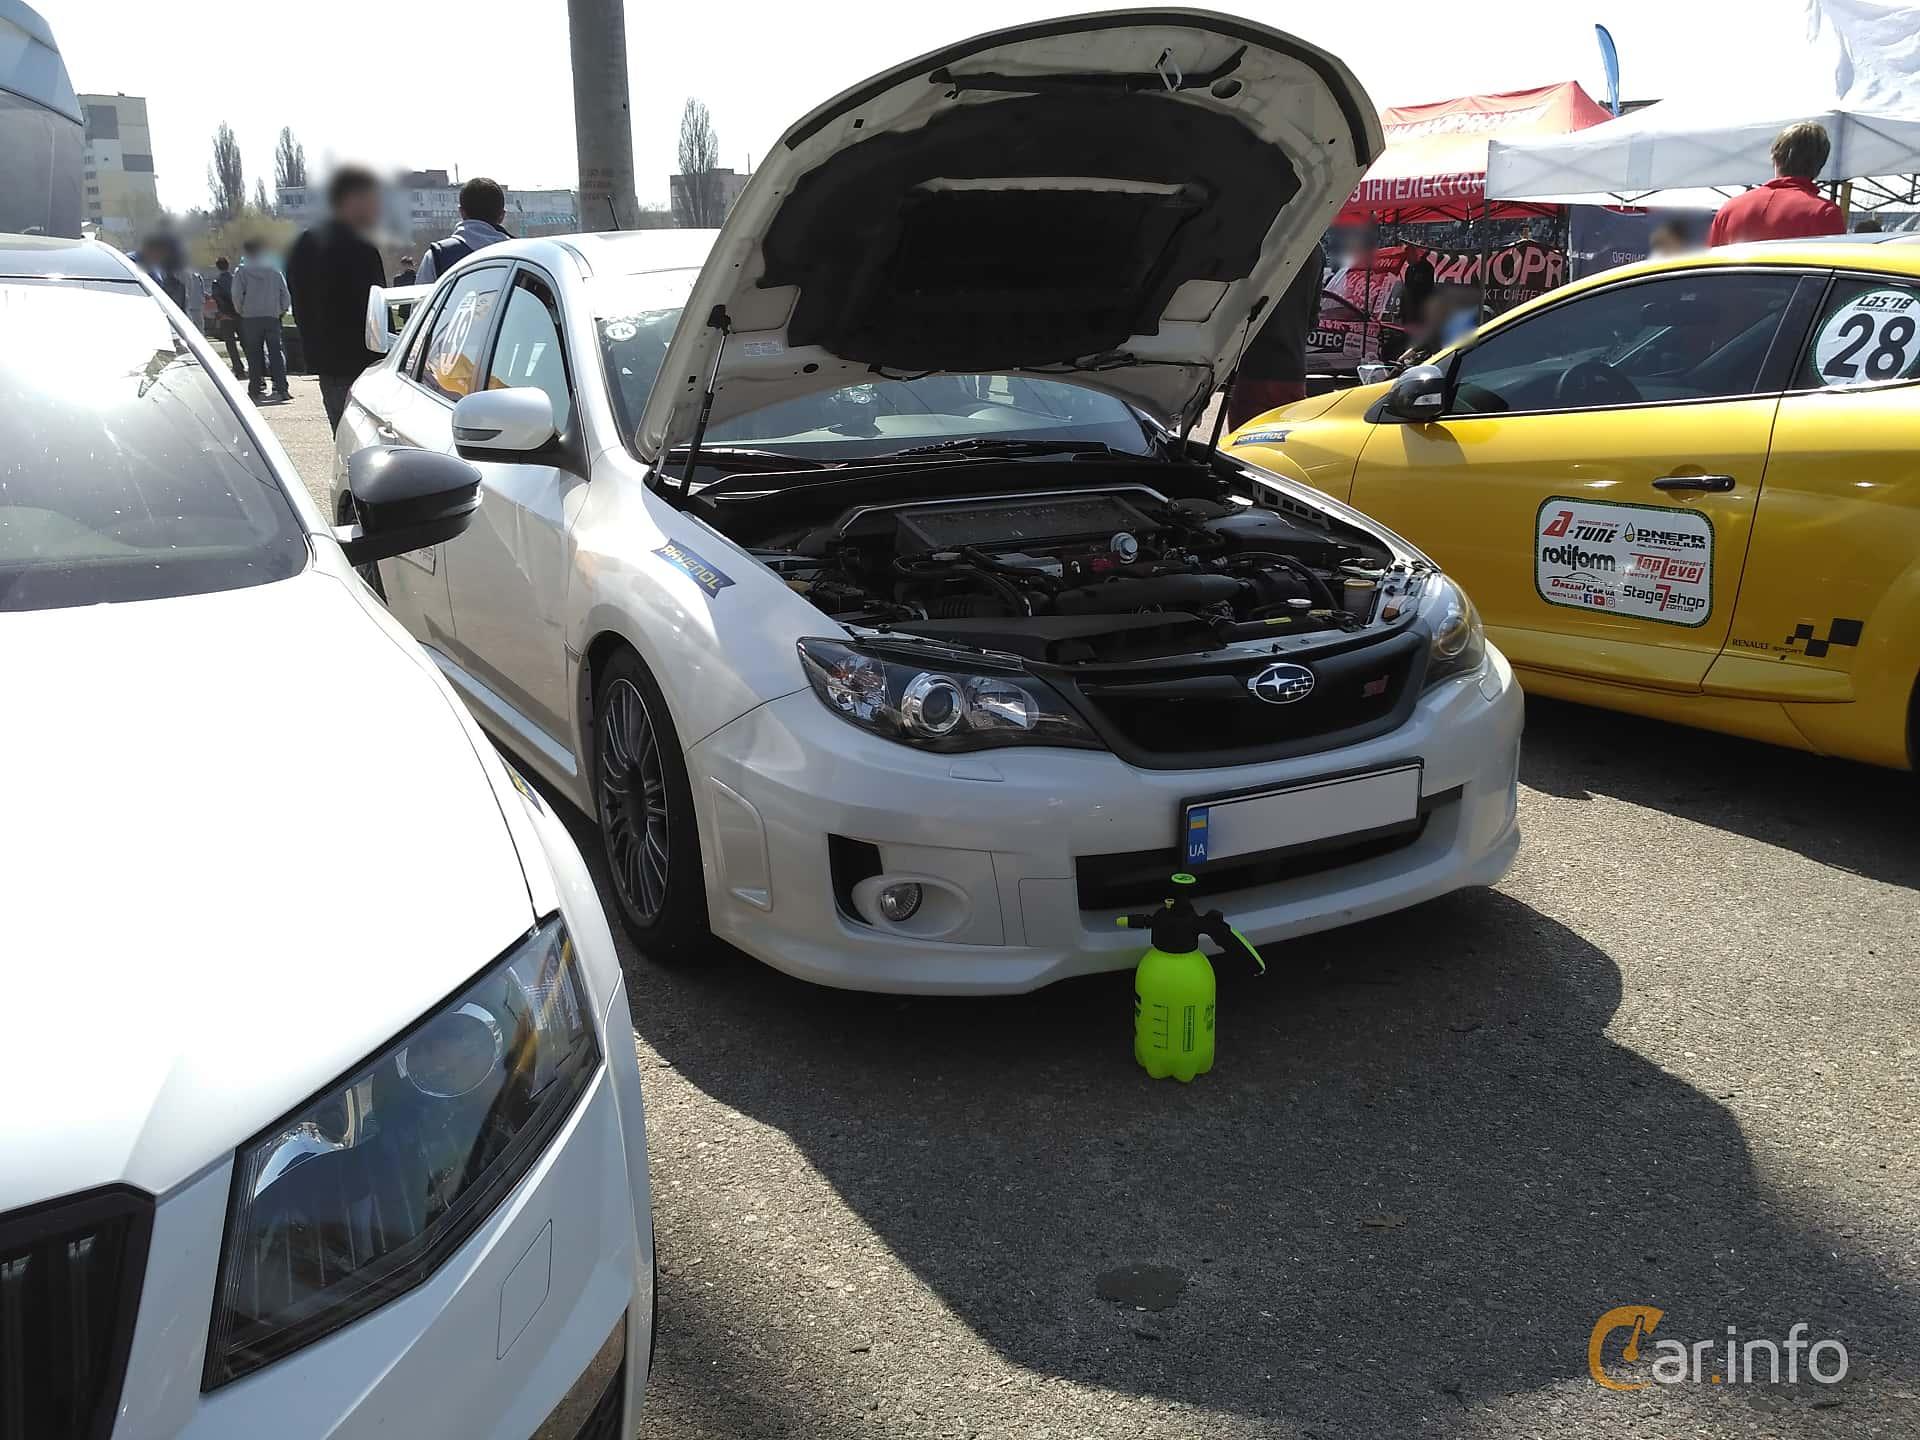 Subaru WRX STi Sedan 2.5 4WD Manual, 300hp, 2007 at Ltava Time Attack 1st Stage